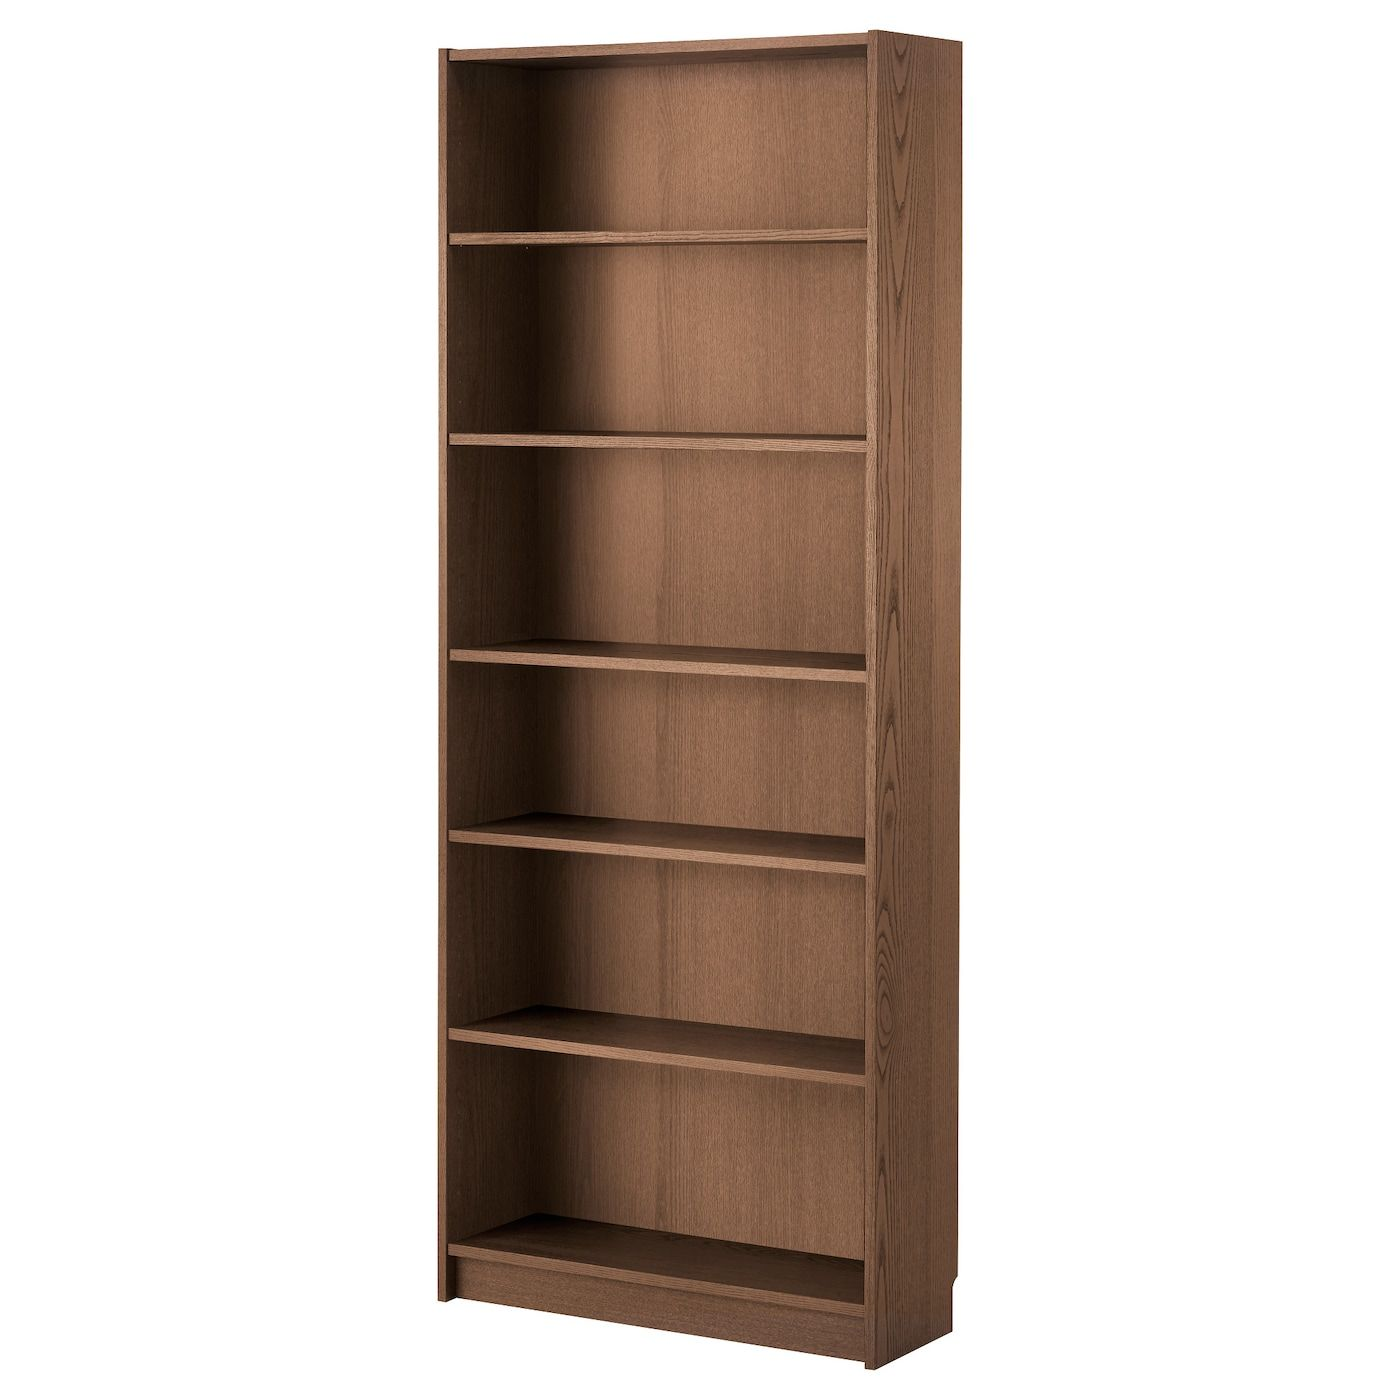 IKEA BILLY, Bookcase, brown ash veneer, , Narrow shelves